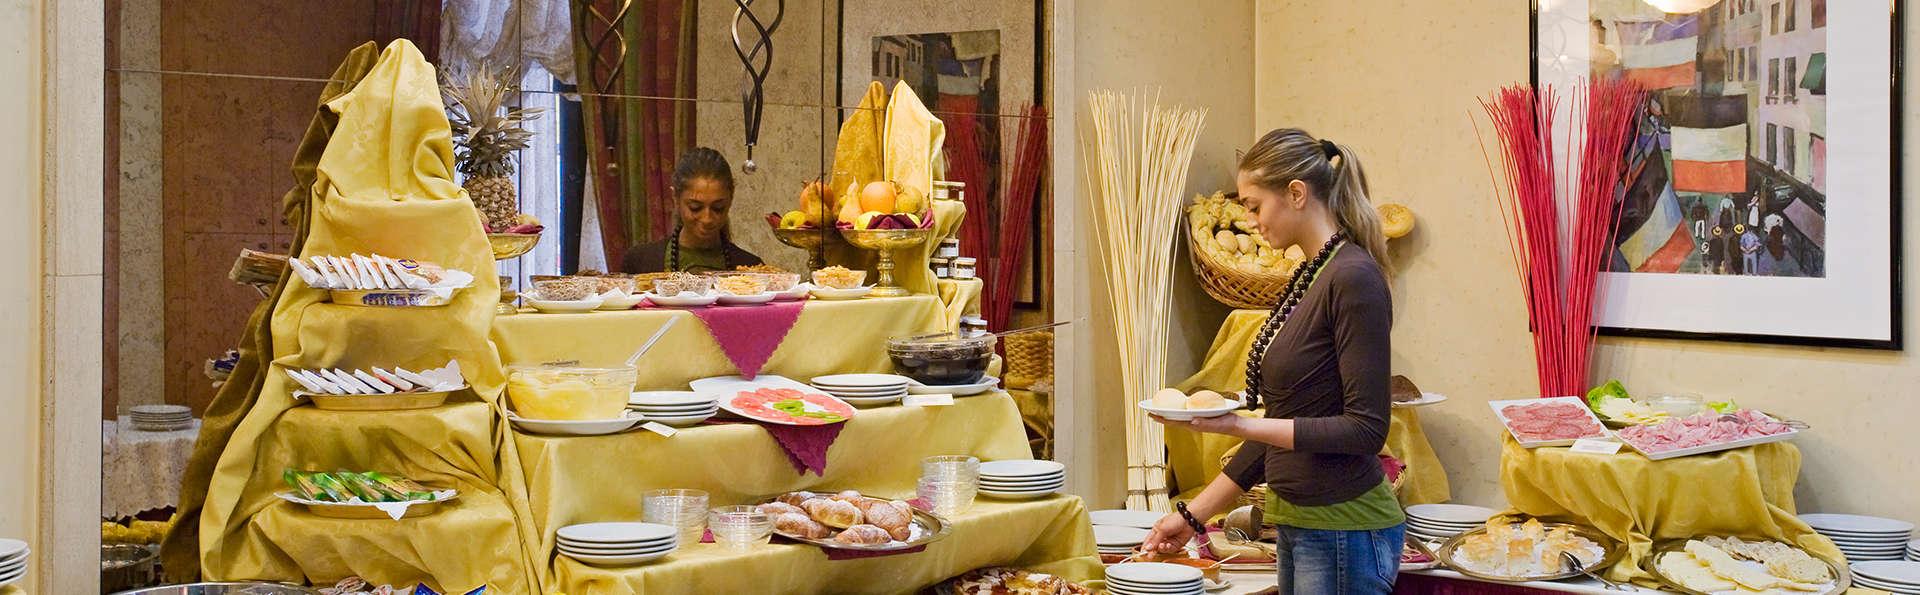 QUALYS-HOTEL Royal Torino - EDIT_breakfast.jpg